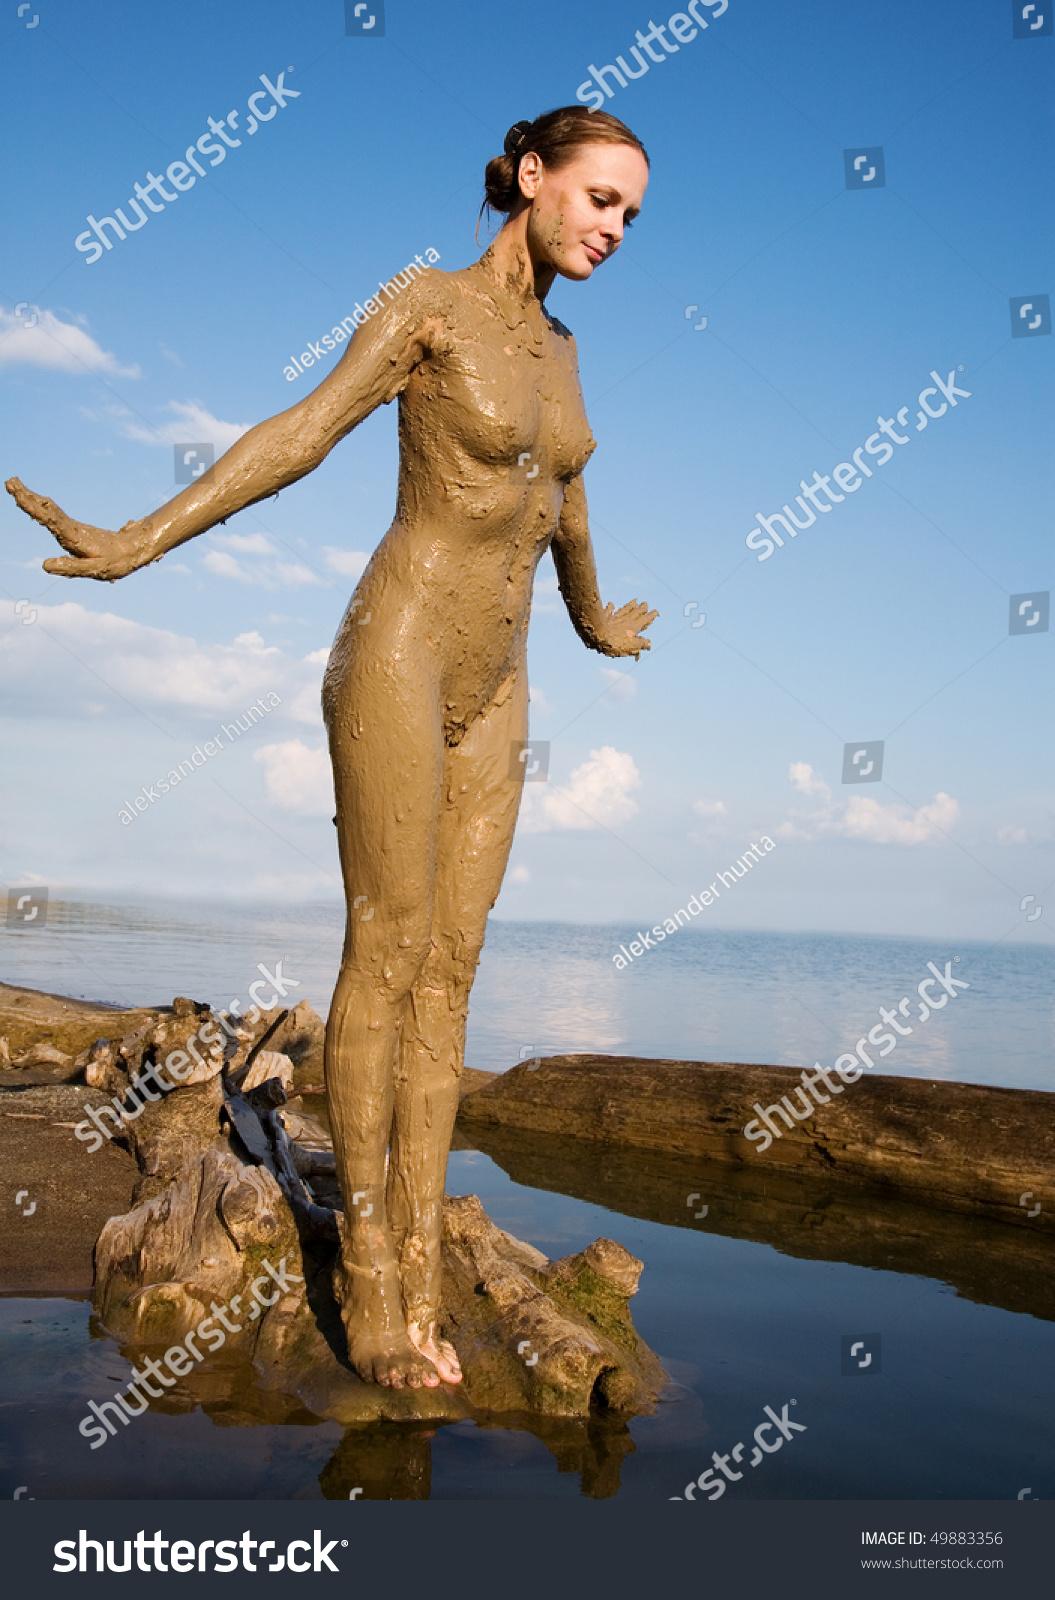 Nude People In Mud  Hot Girl Hd Wallpaper-1523